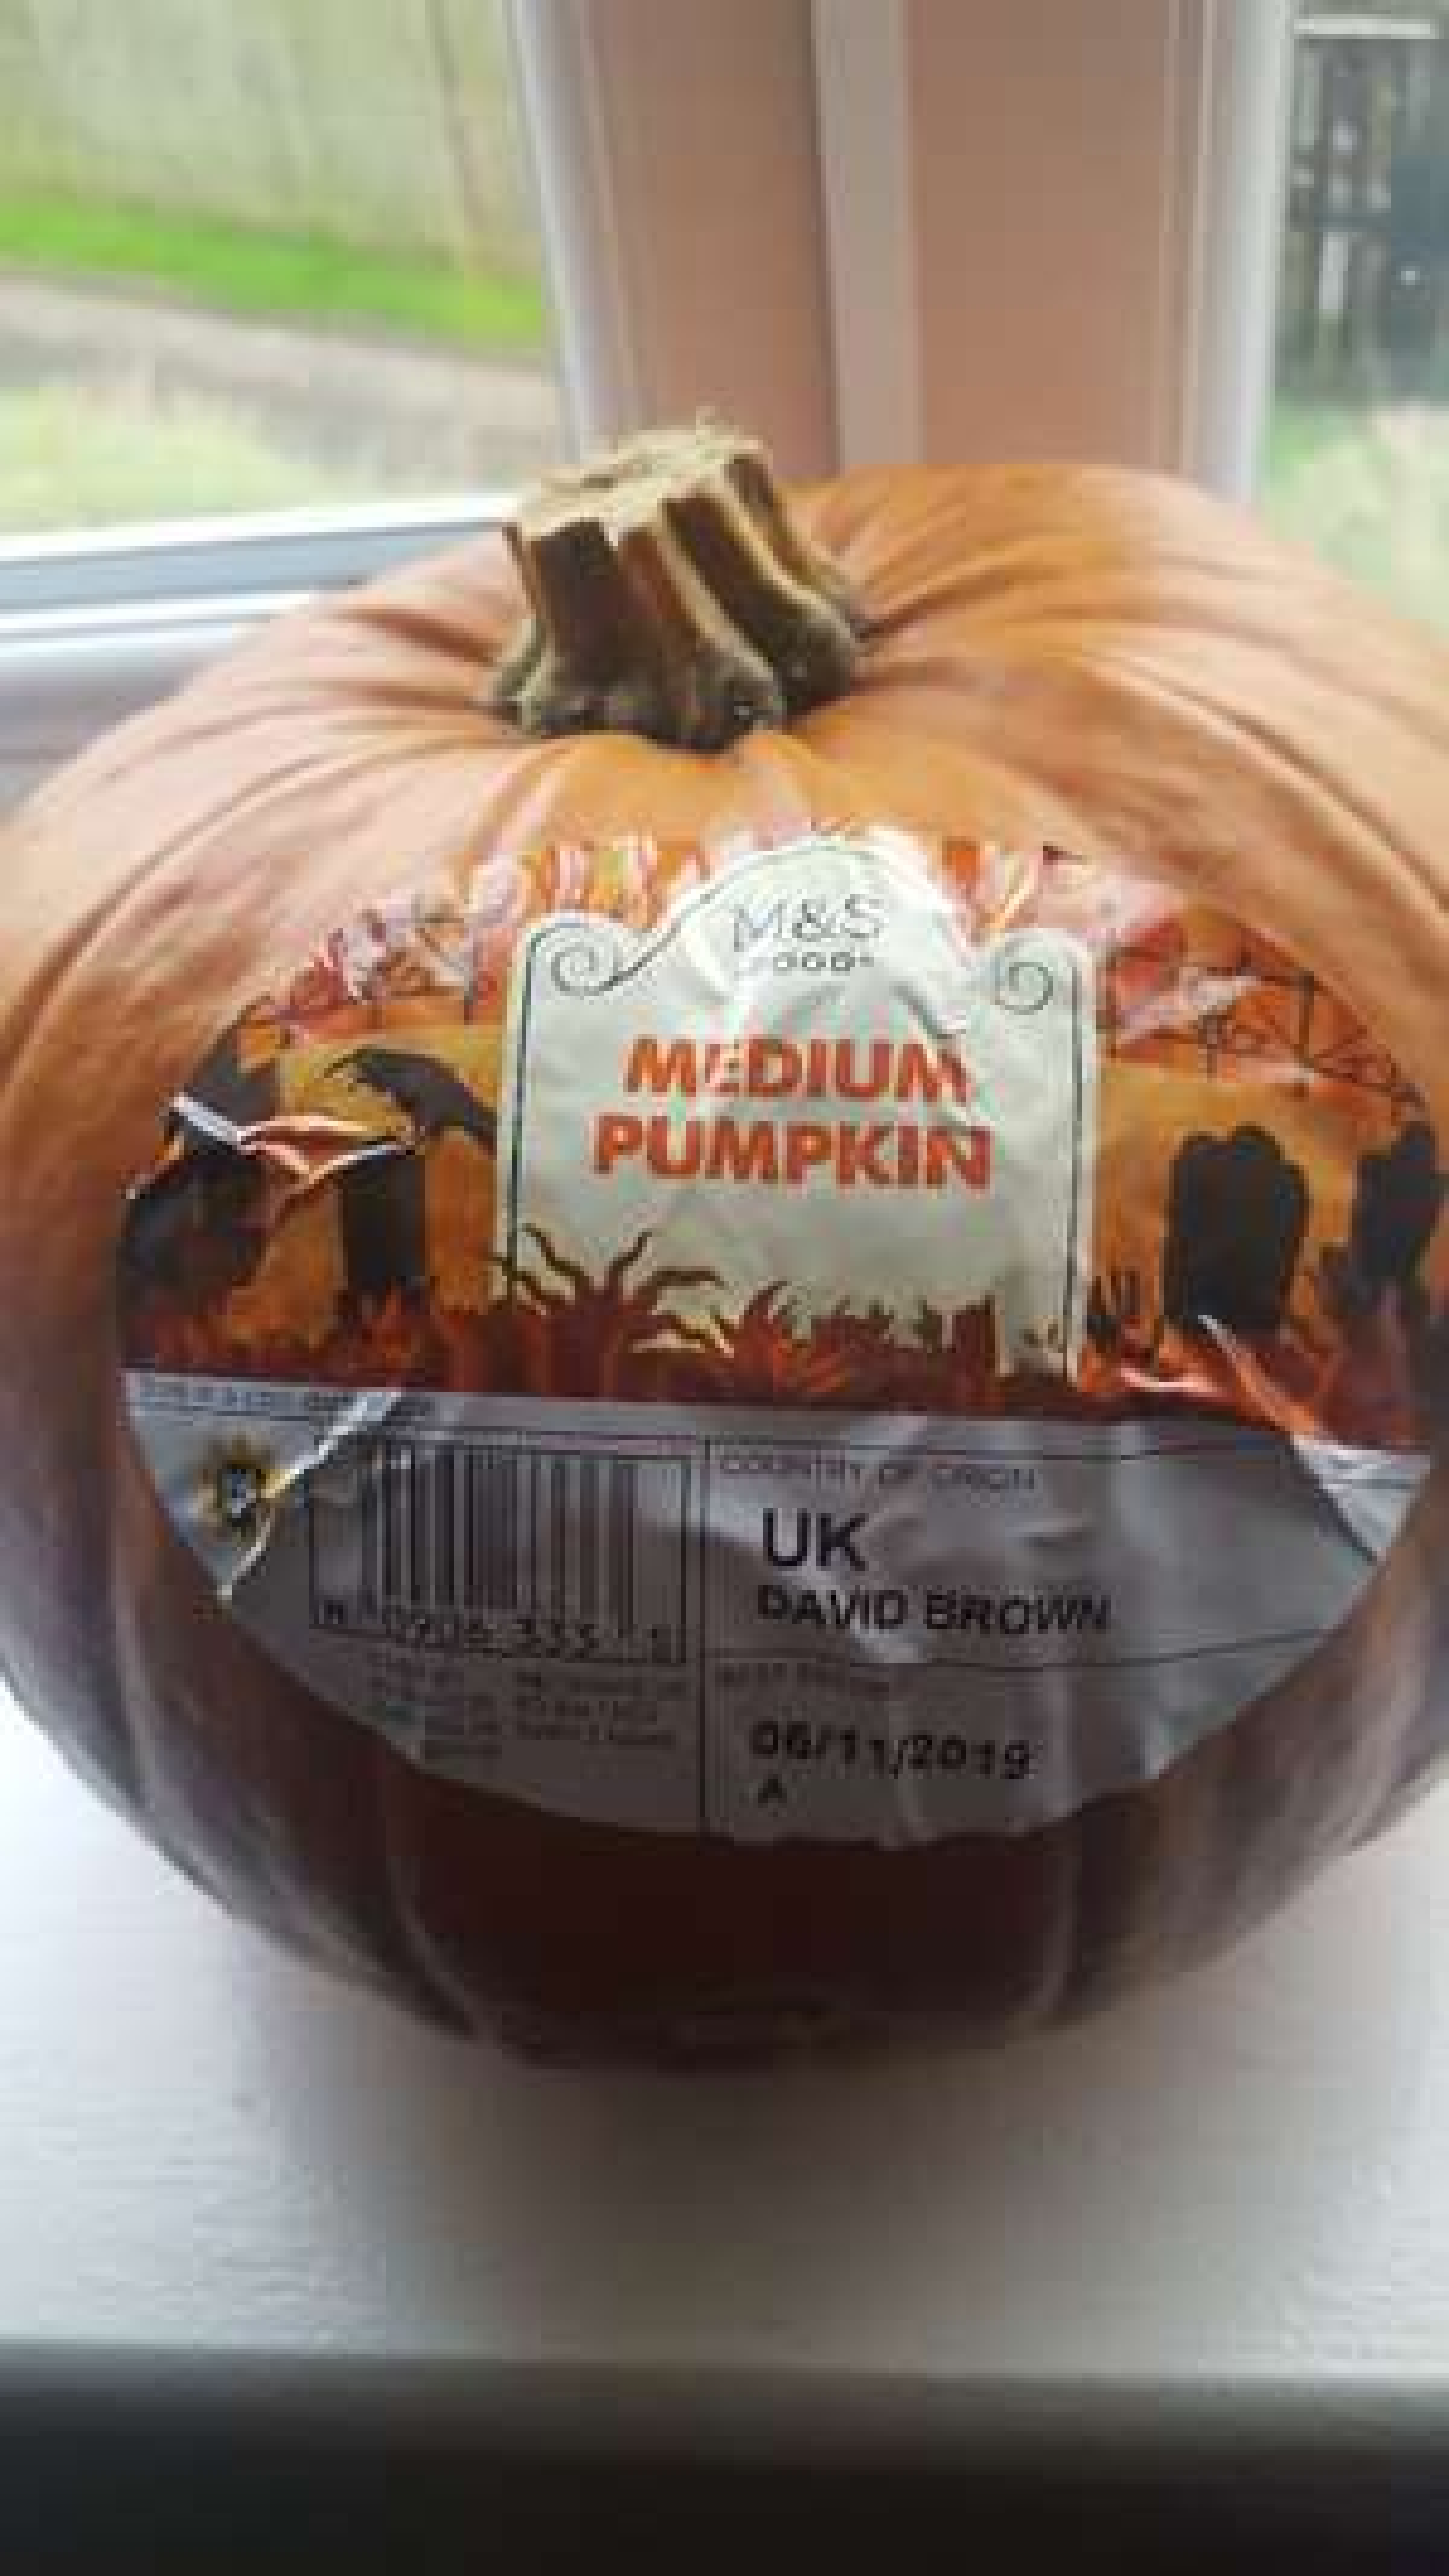 M&S Medium Pumpkin - 65p Instore (Birstall)